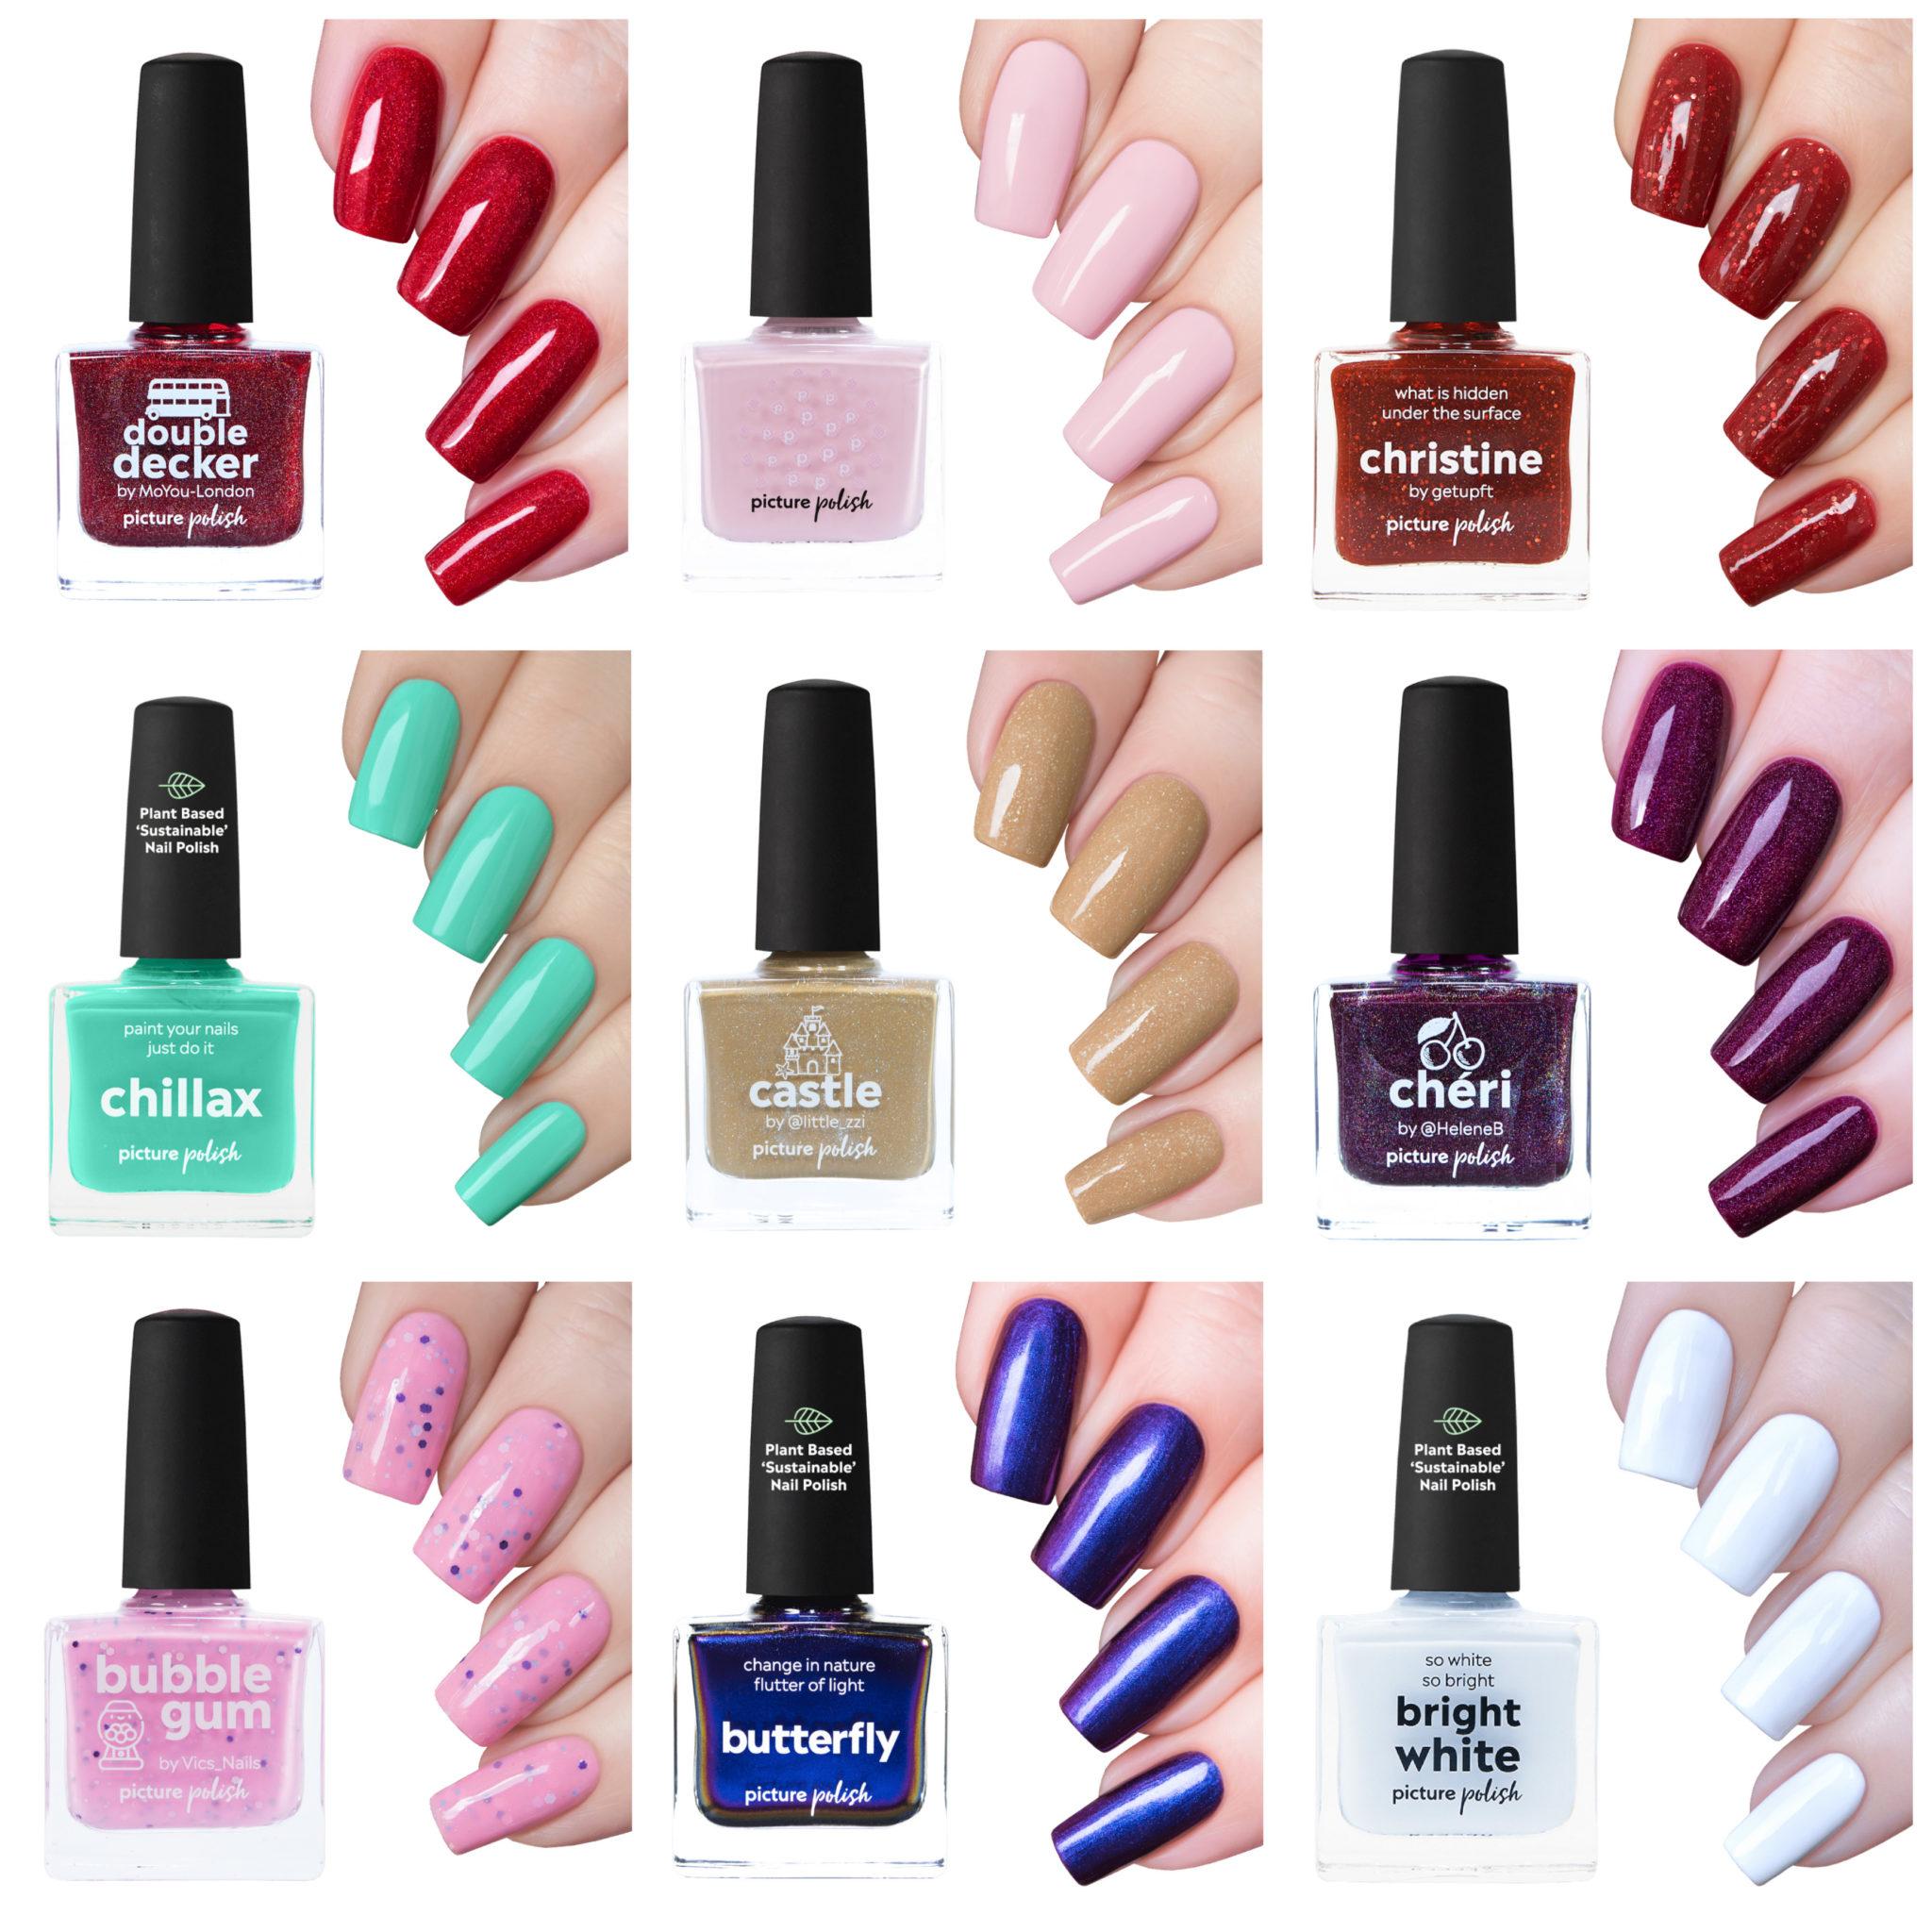 Picture Polish nail polish collage